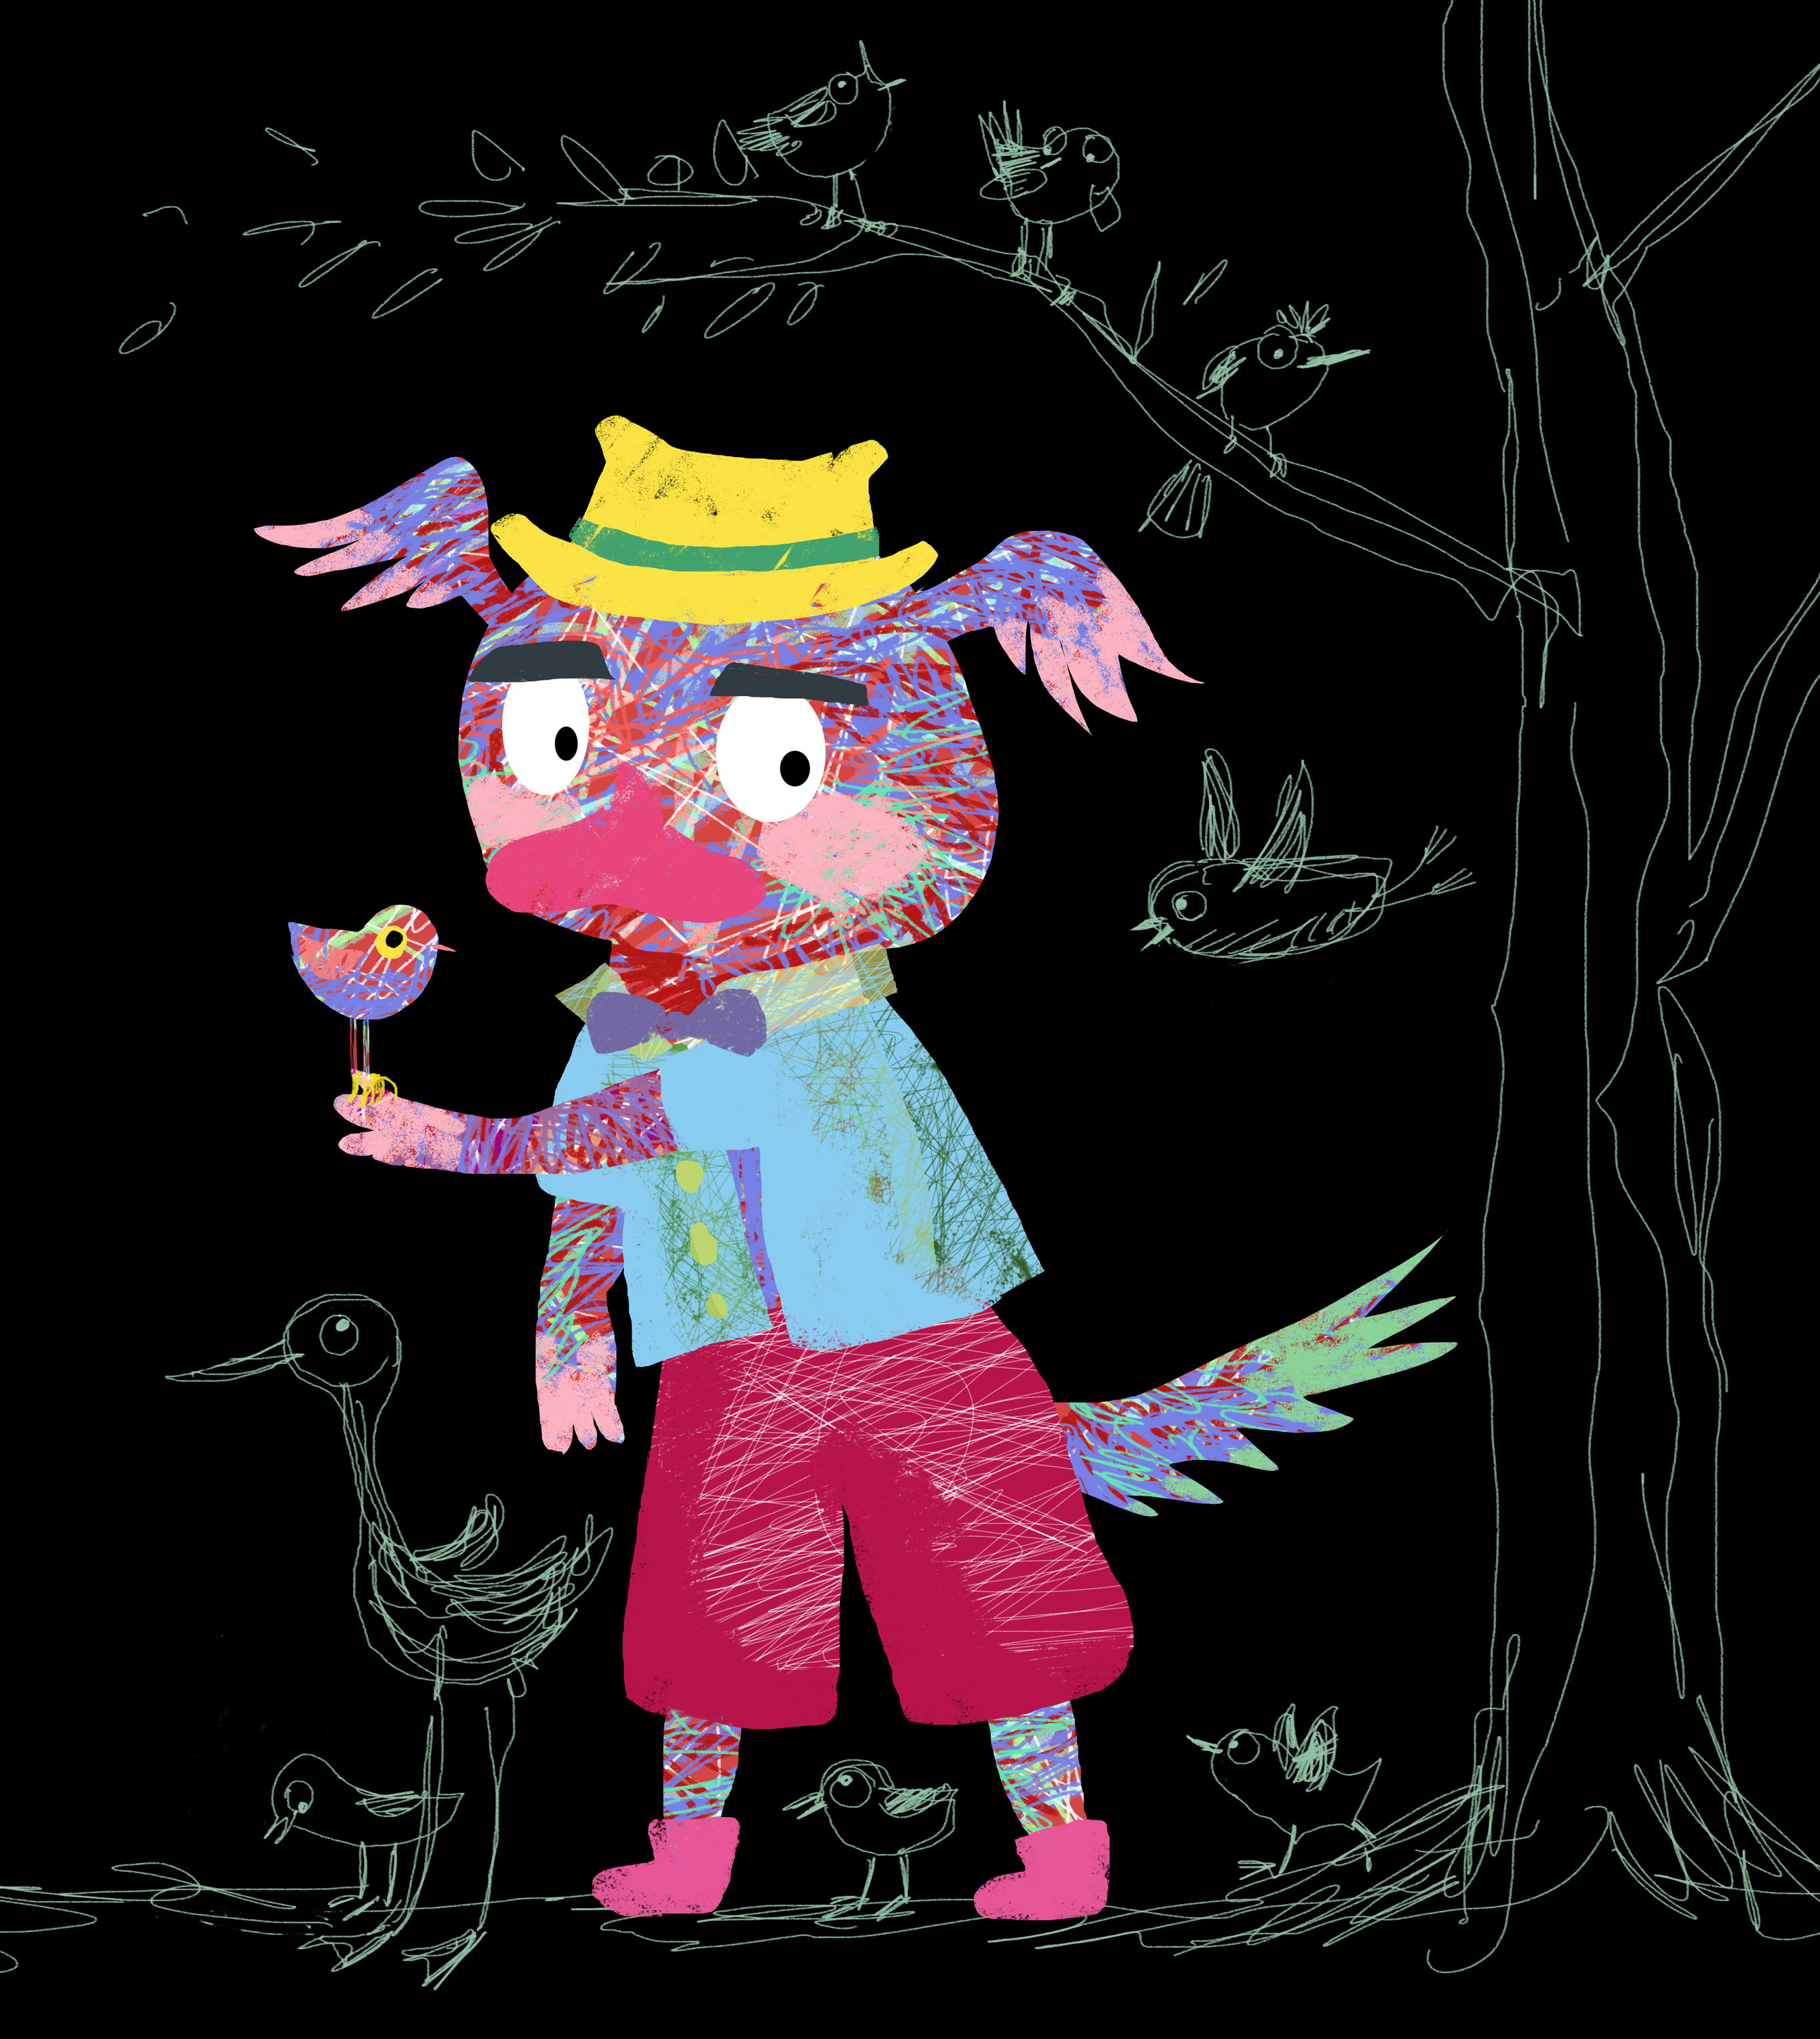 the bird lover judywatsonart lores